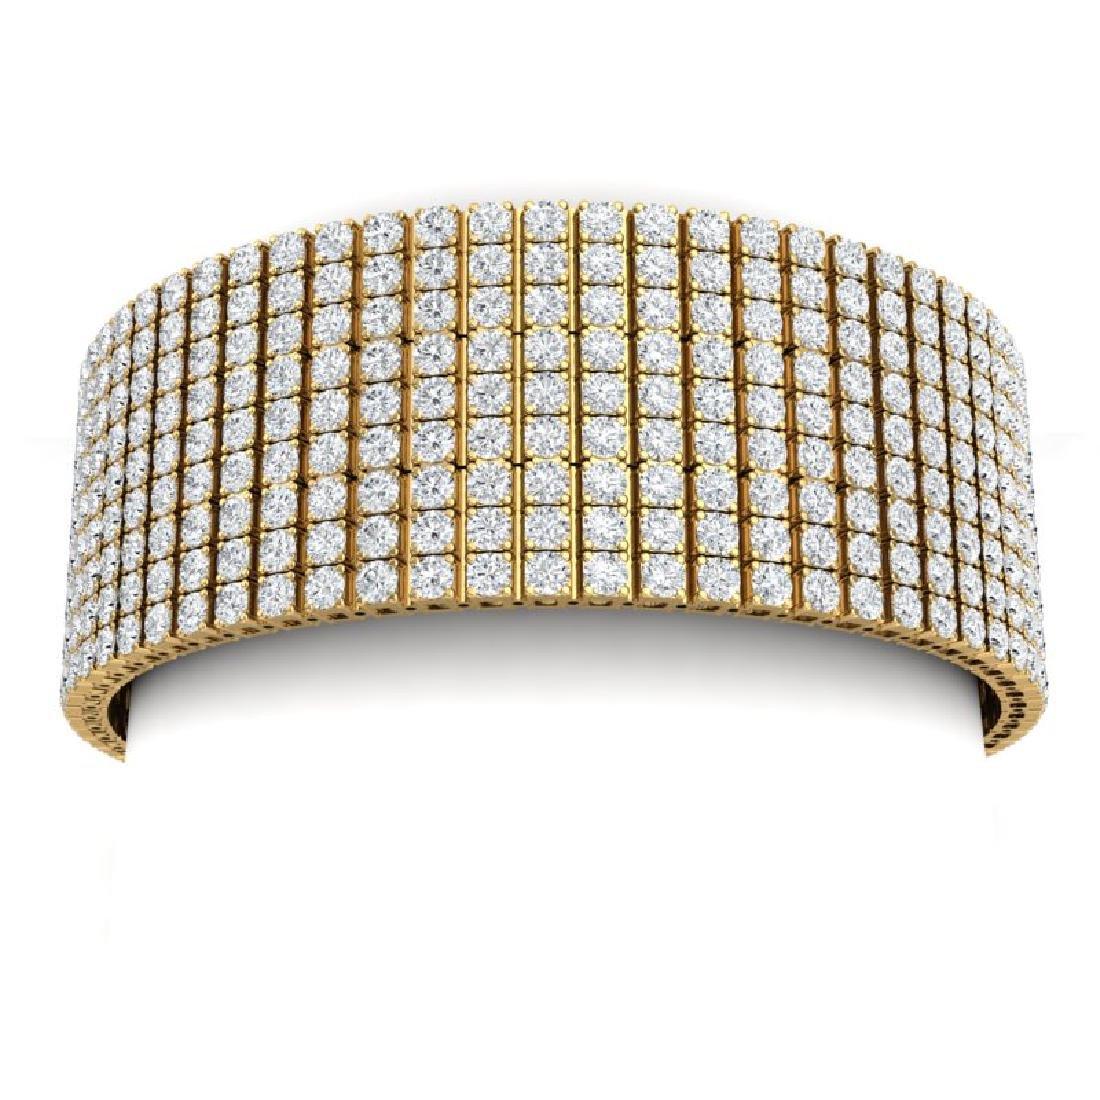 43 CTW Certified VS/SI Diamond Unisex 8 Inches Bracelet - 2